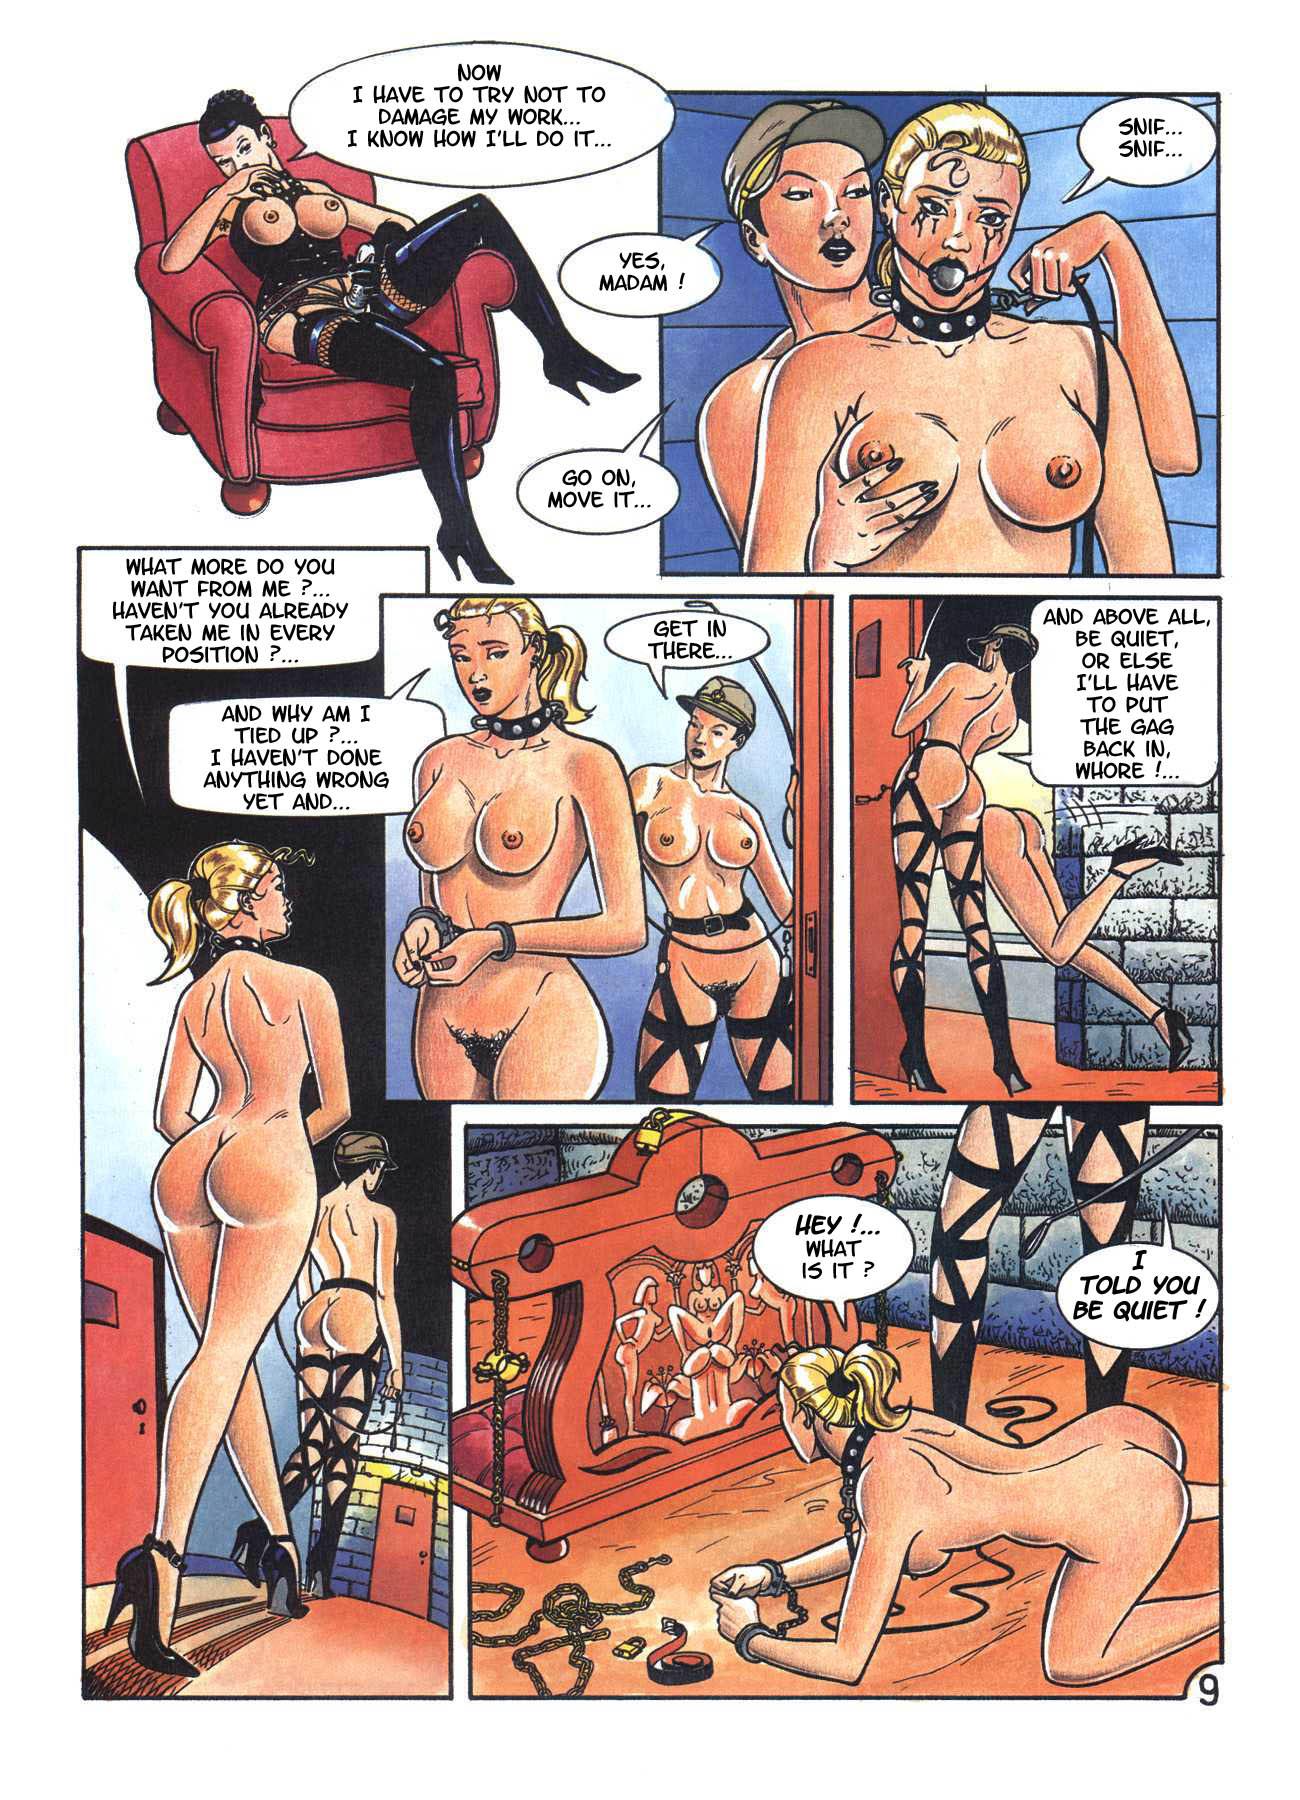 Free bdsm comics links